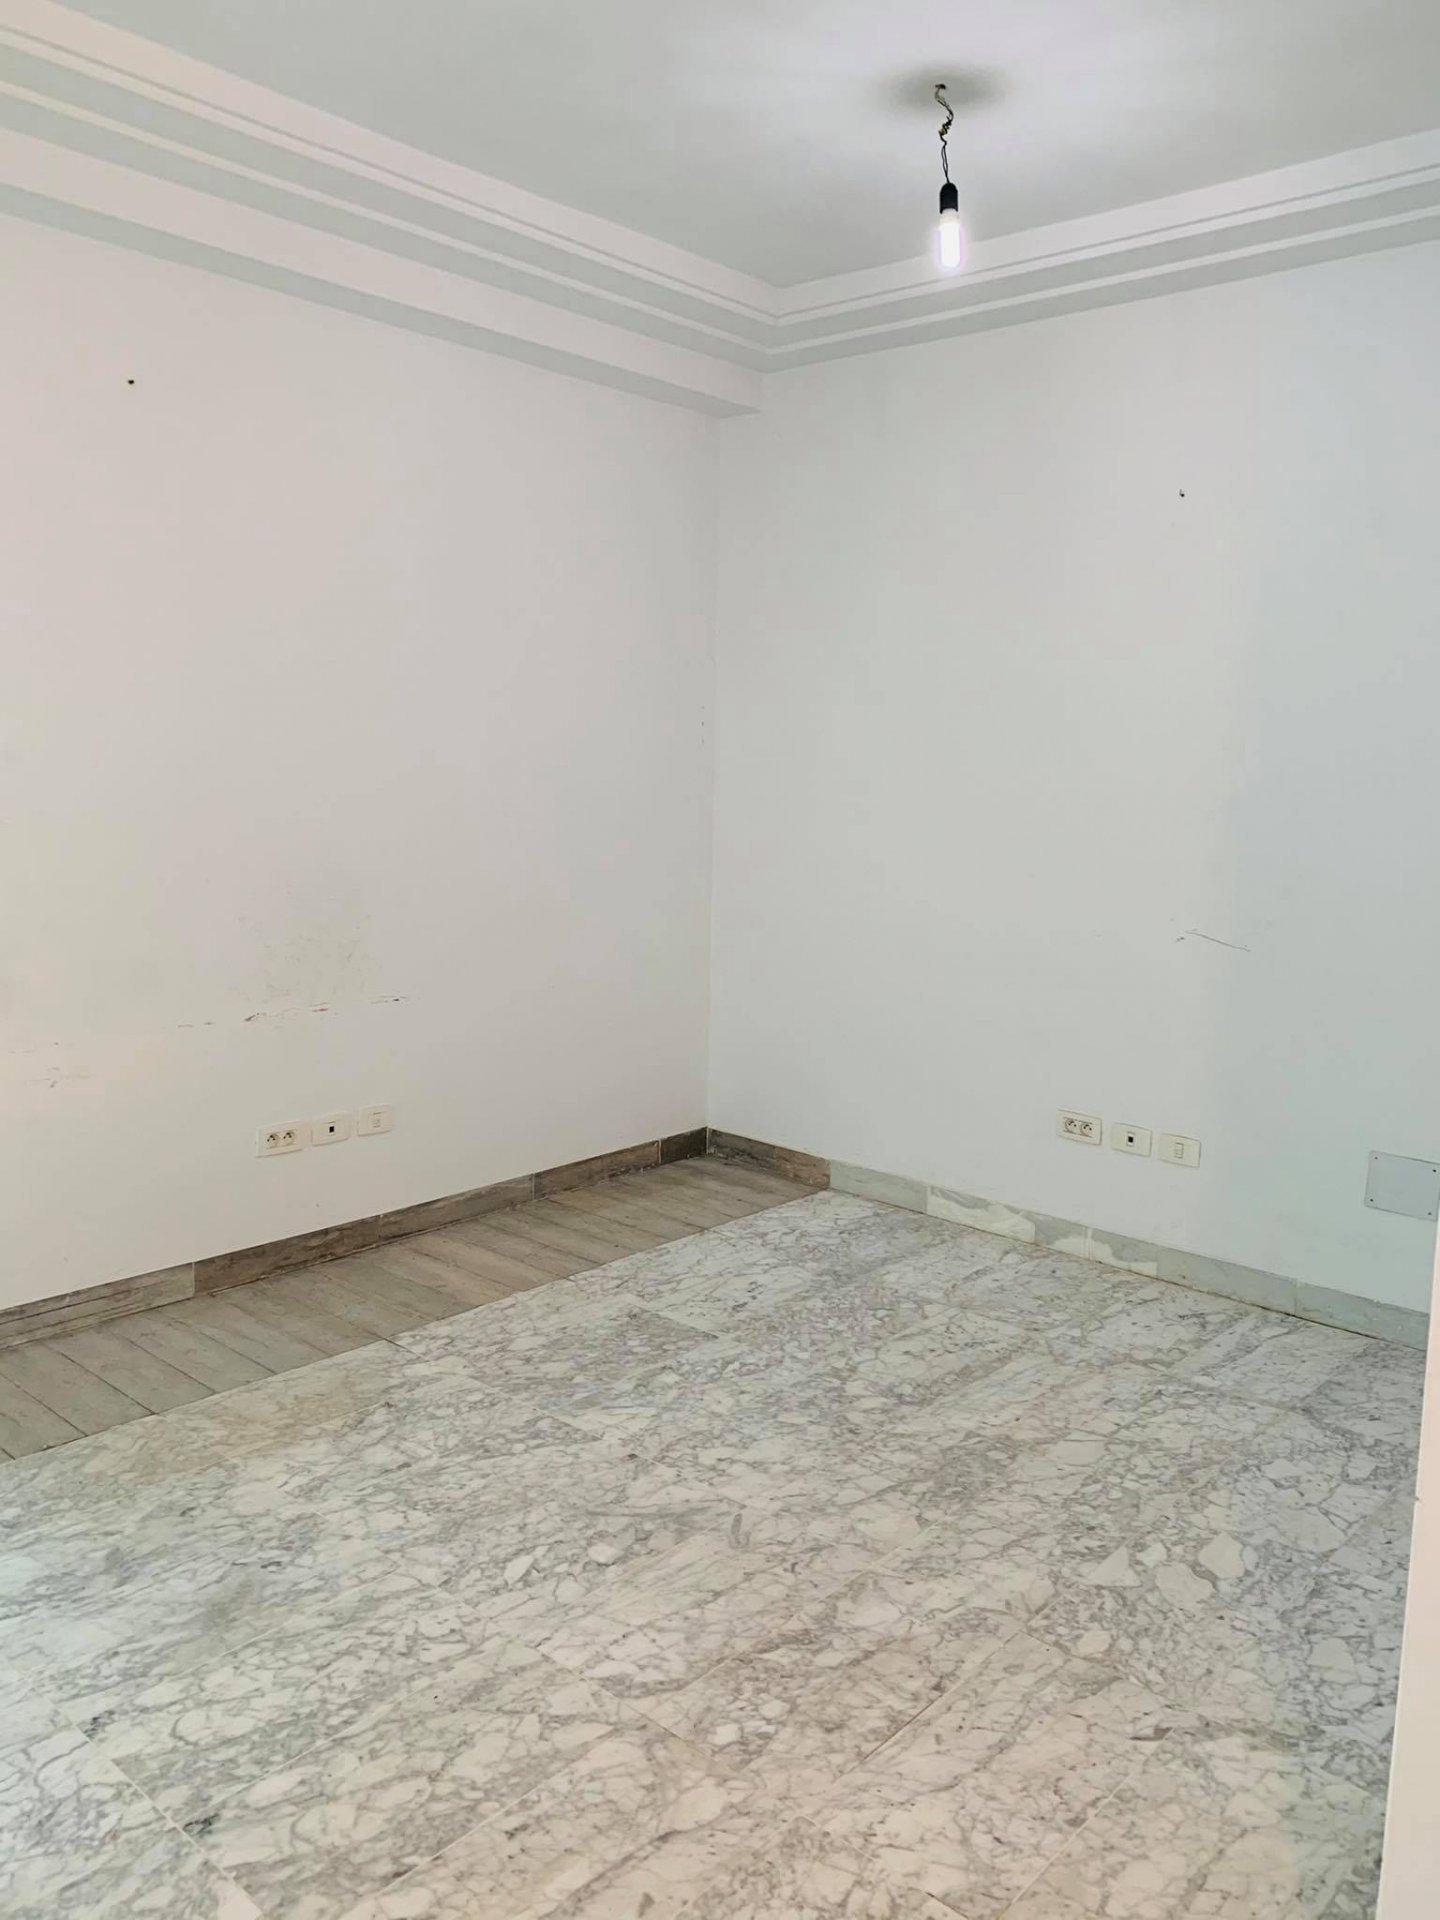 Location Bureau de 3 pièces au Ennasr 2.